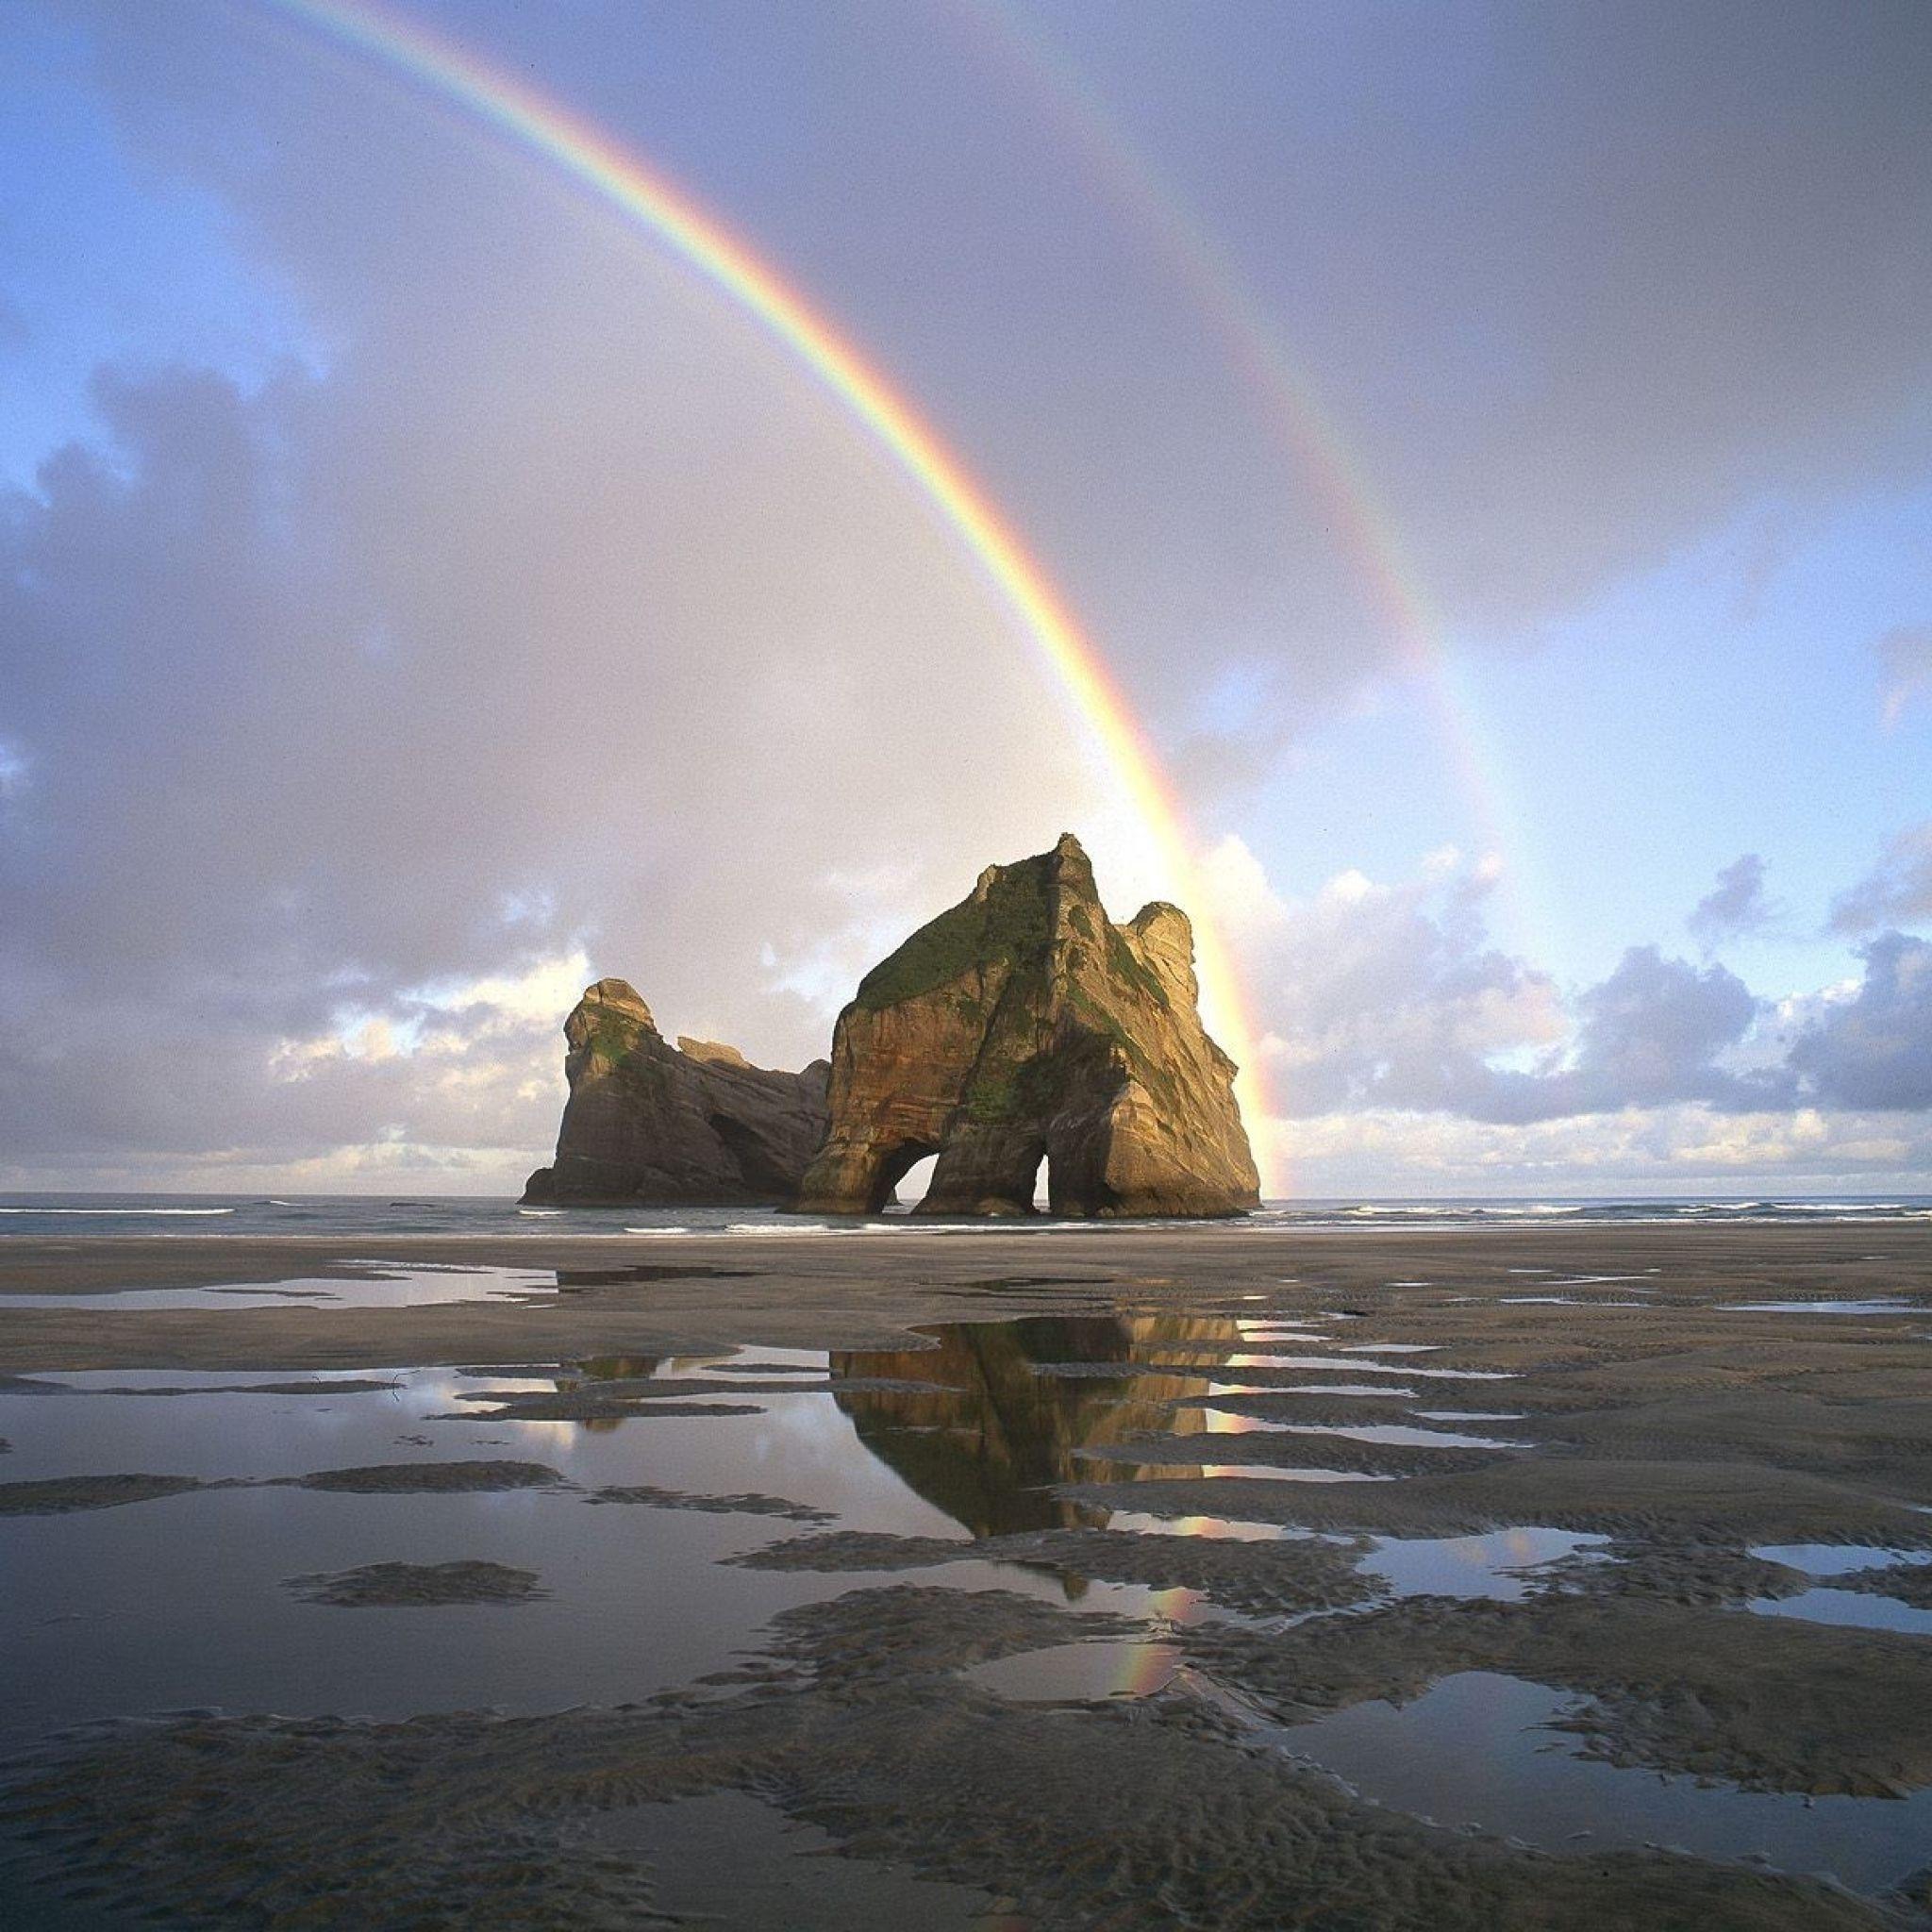 2048x2048 Wallpaper areia, arco-íris, rochas, piscinas, água, nova zelândia